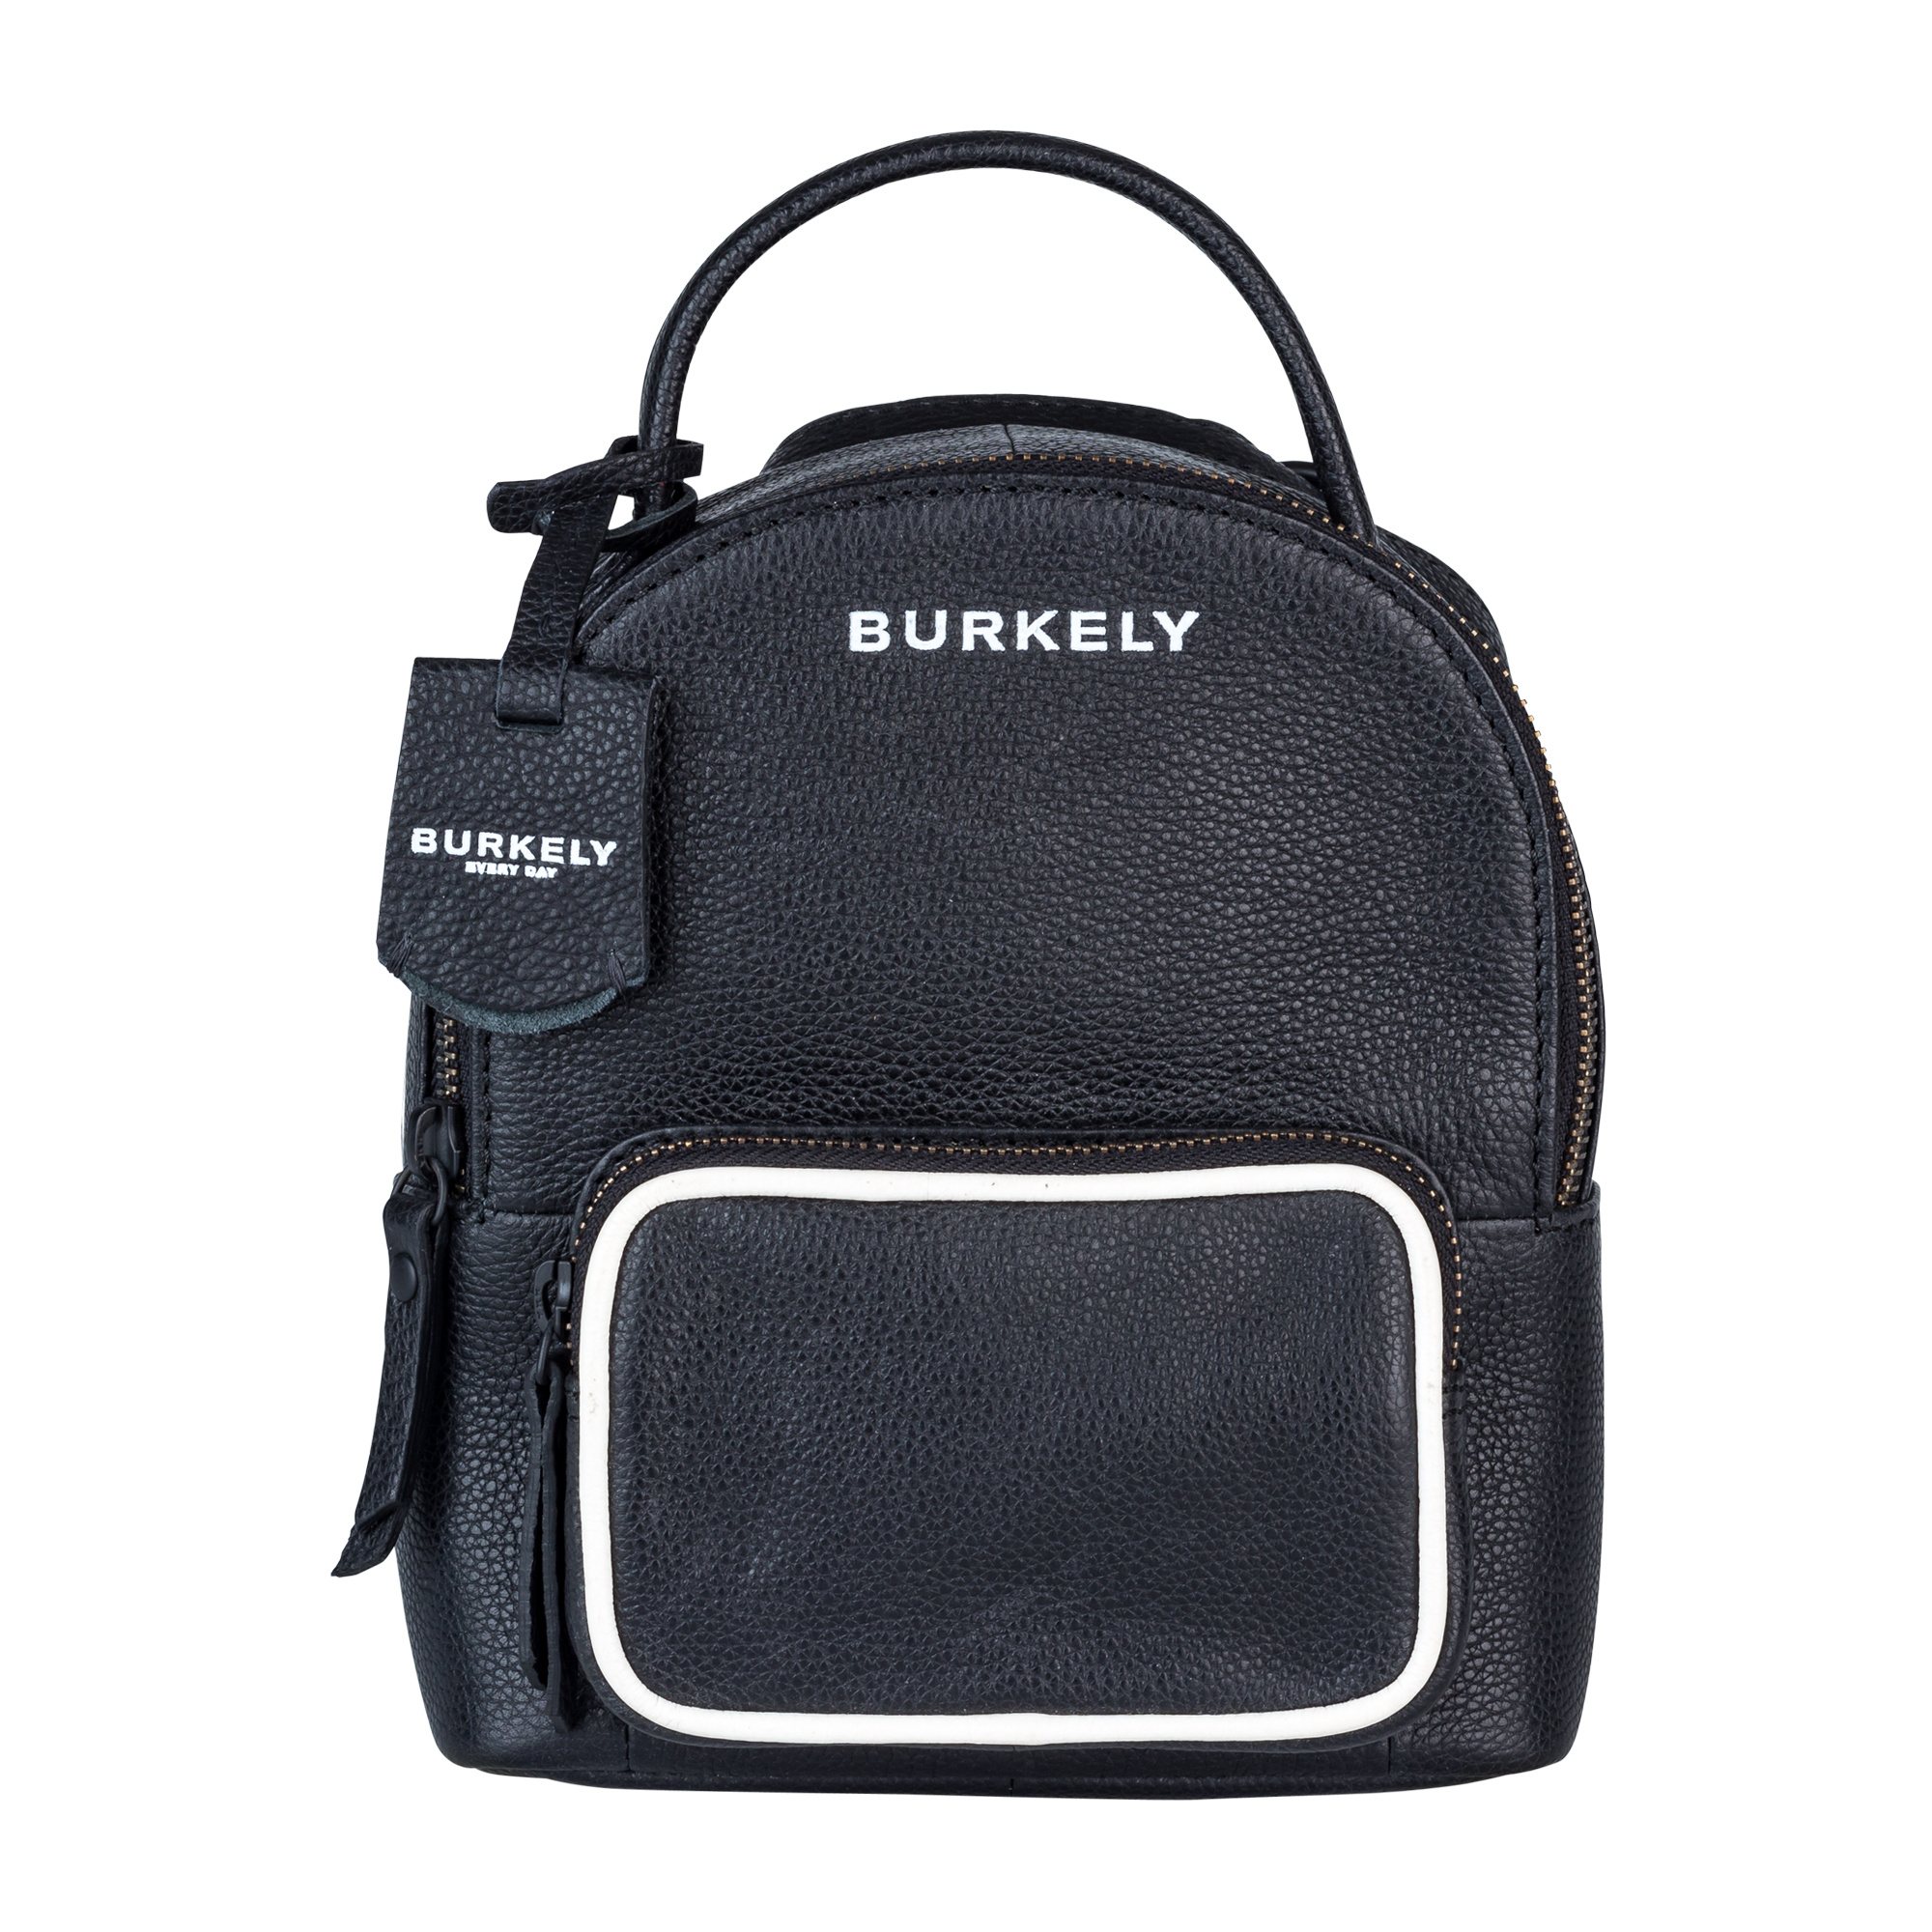 8ed49ba9d7d Burkely Rugzak Festival Urban Backpack Zwart Kopen? - ByMetz.nl ...